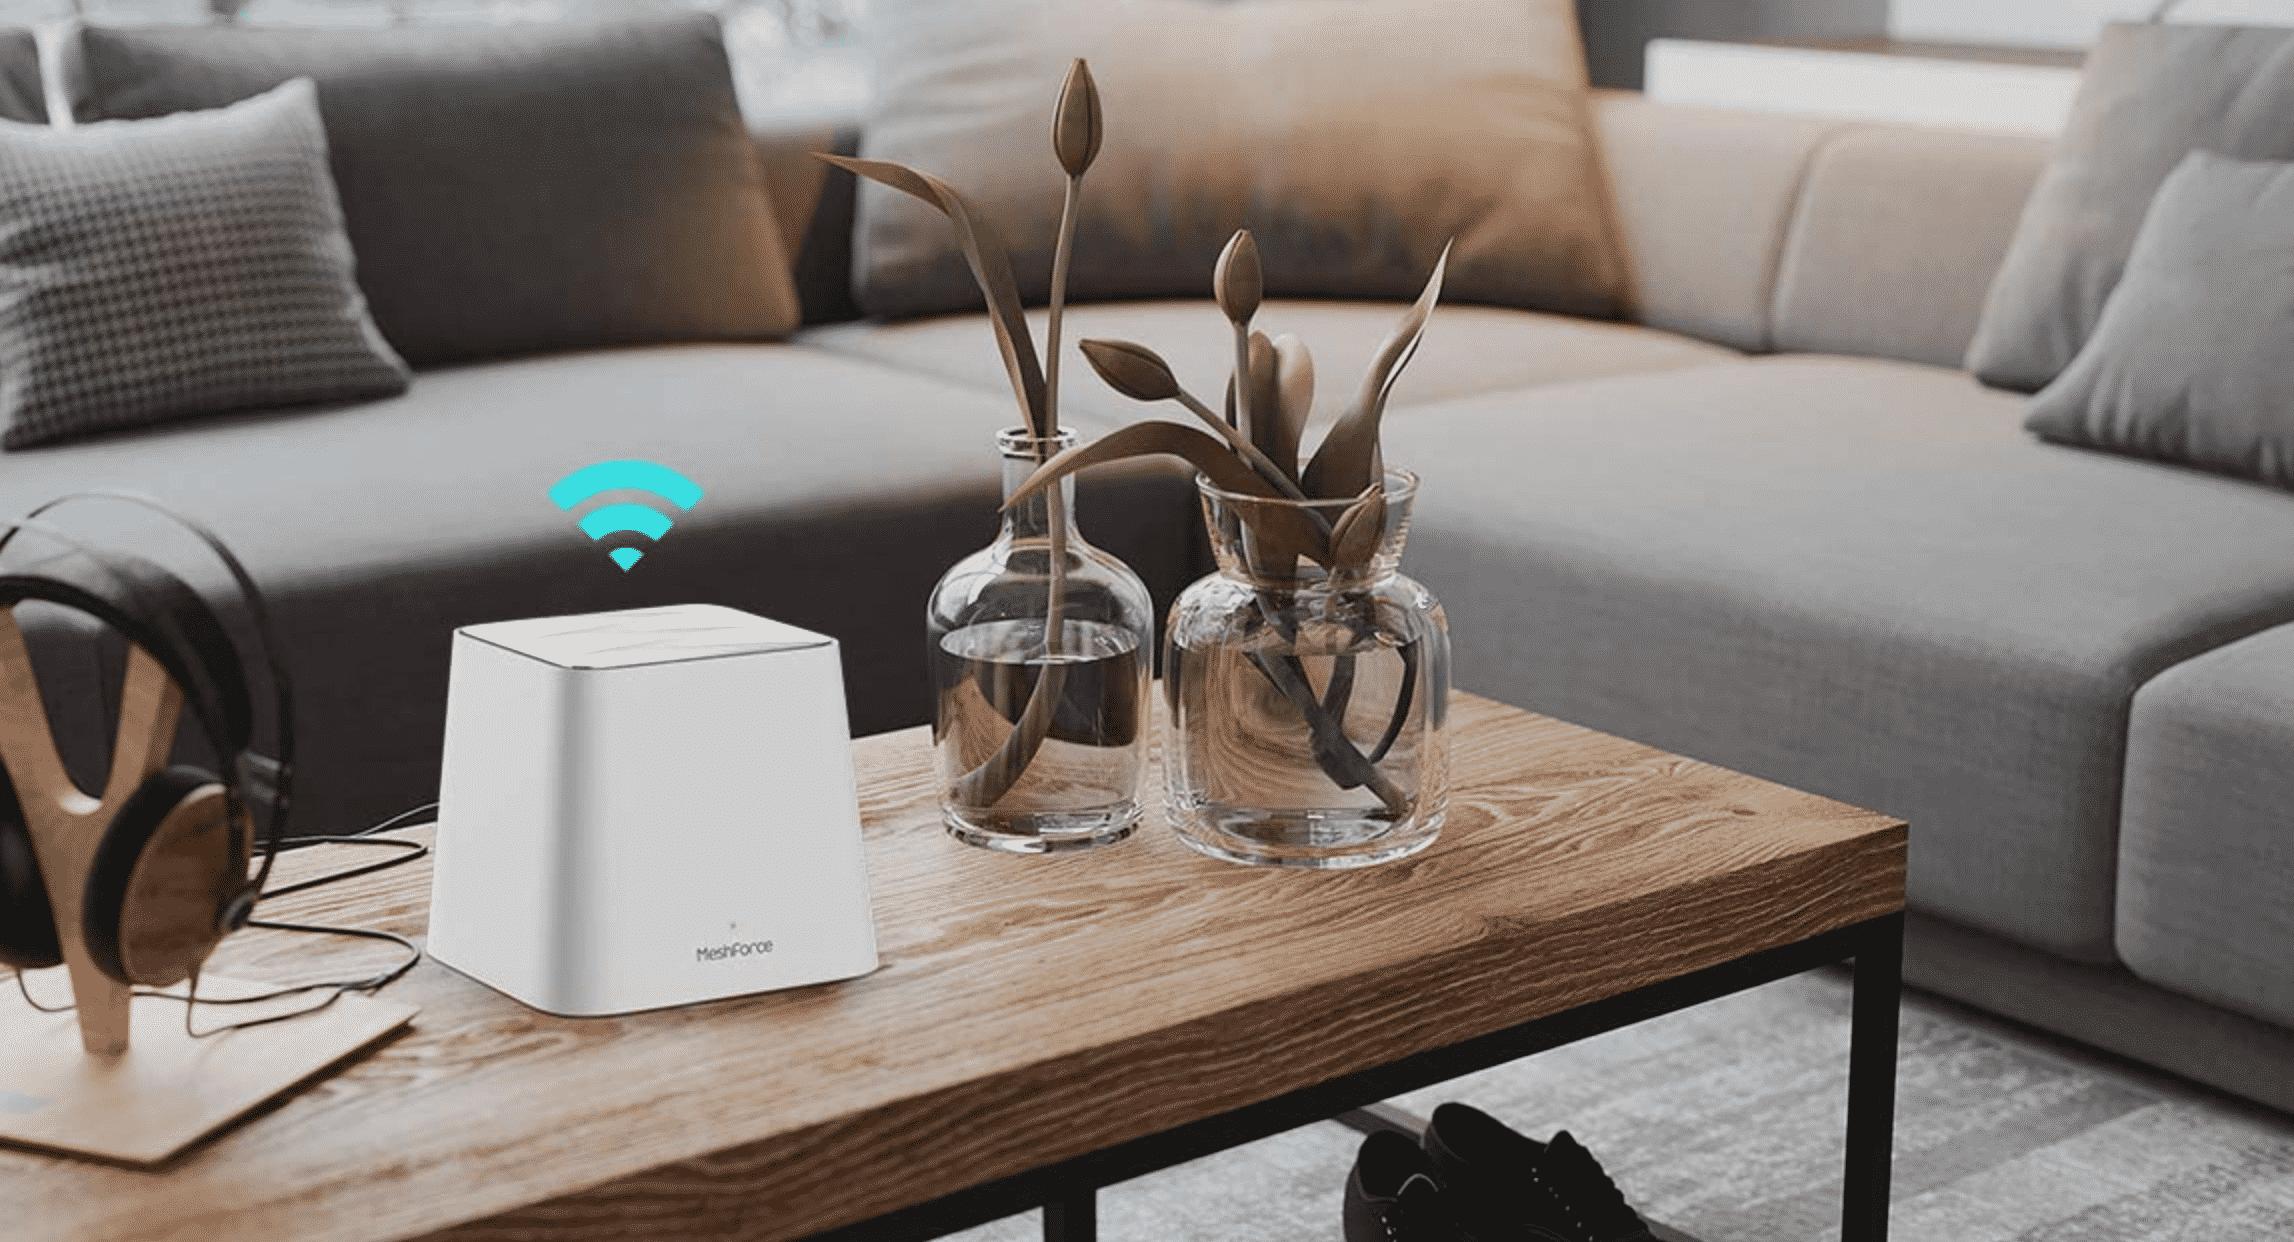 Meshforce Whole Home Mesh WiFi System M3s Suite